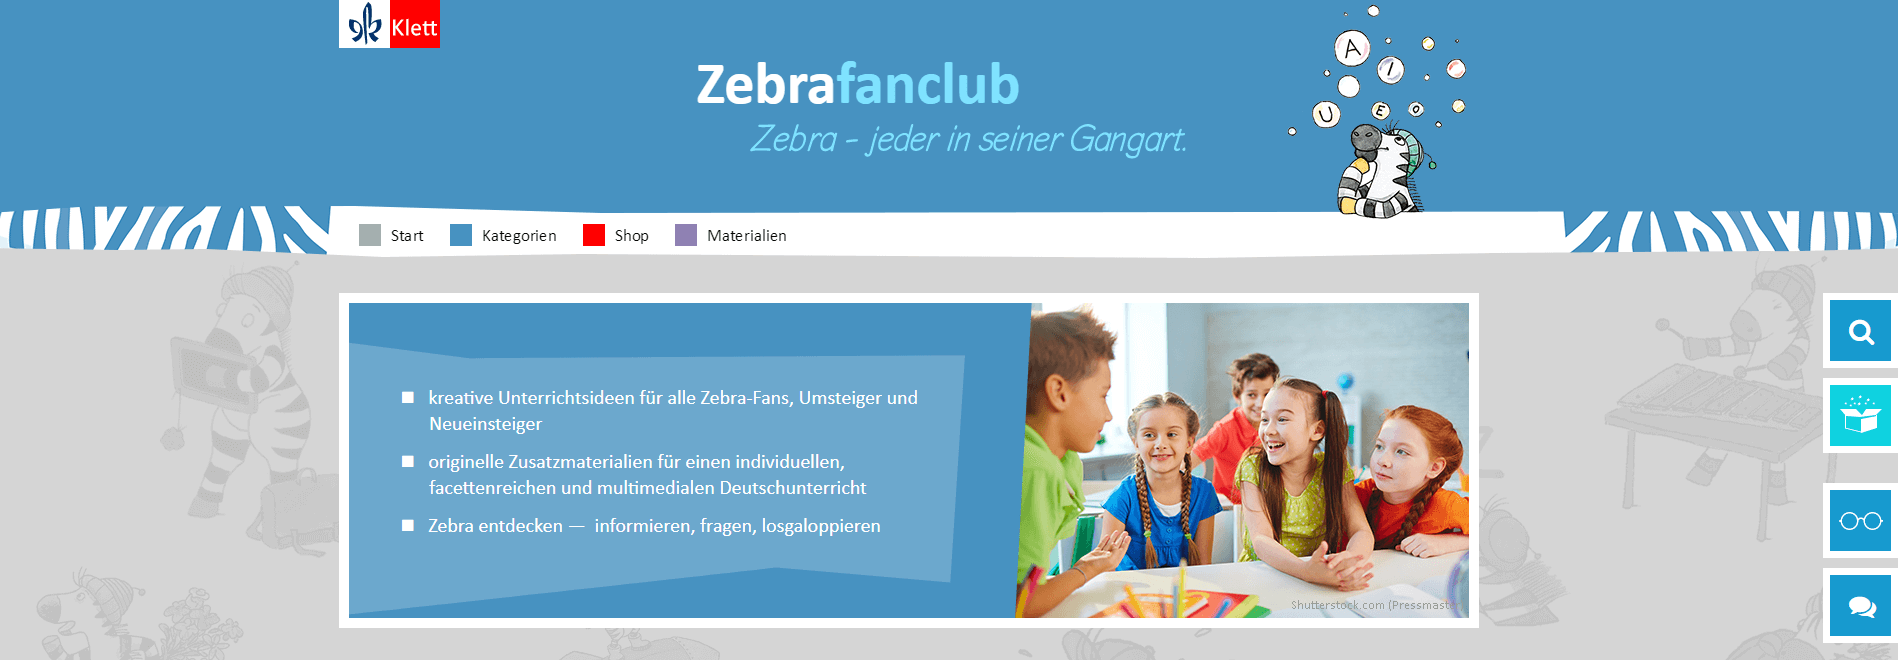 Zebrafanclub - Klett Grundschulverlag